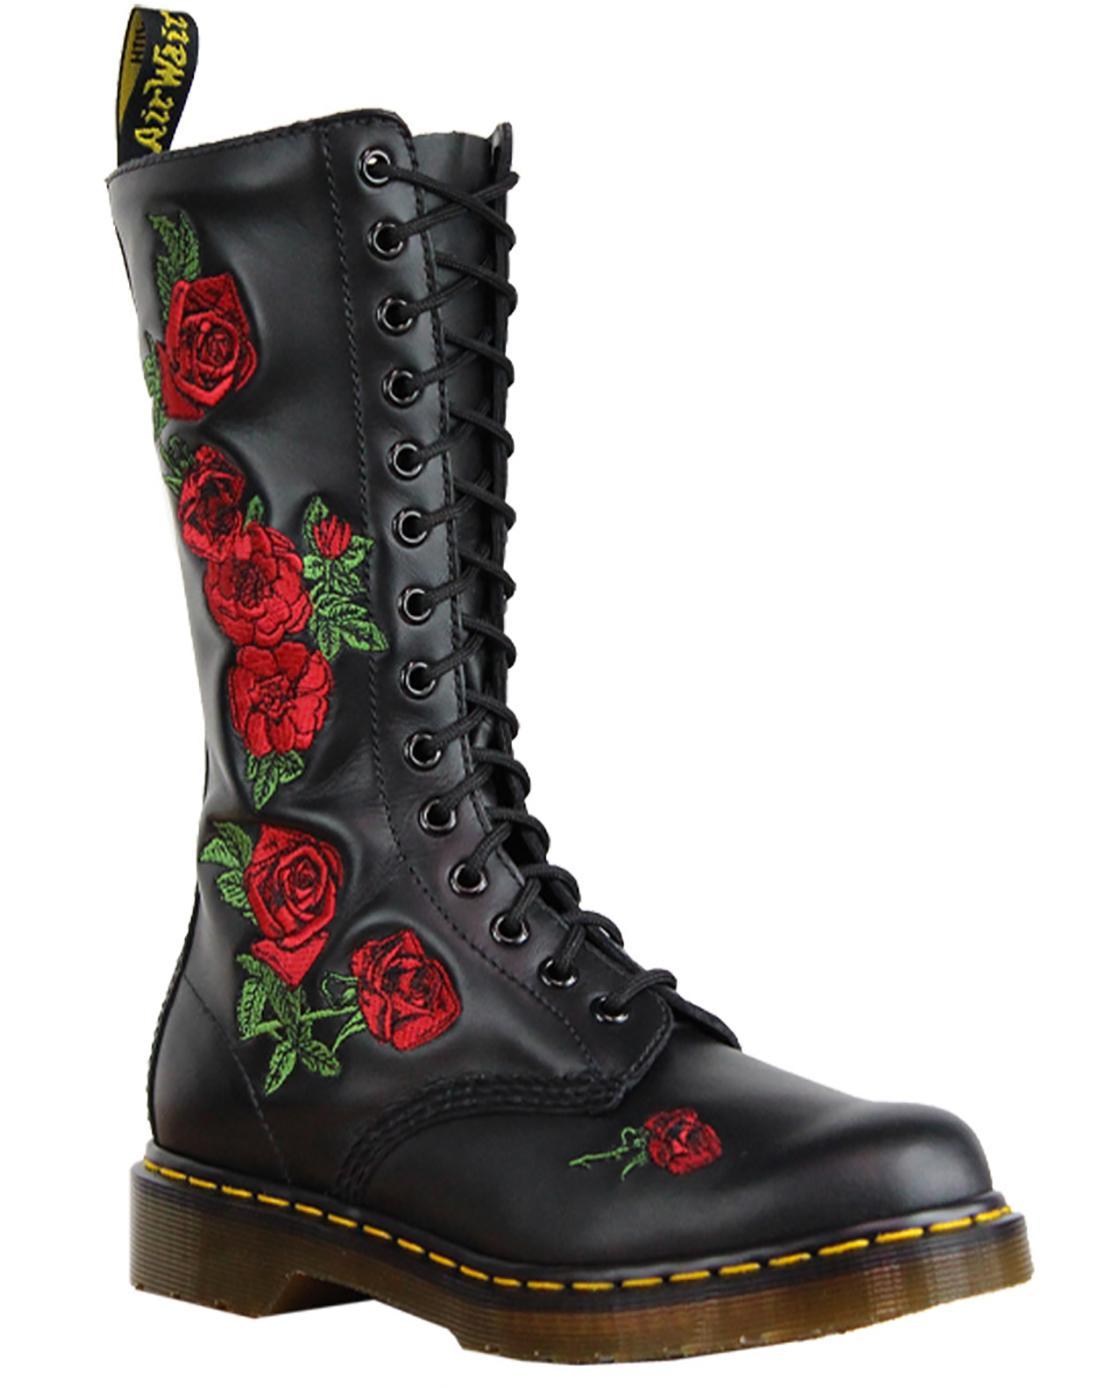 Vonda DR MARTENS Retro 70s 14 Eyelet Boots Black